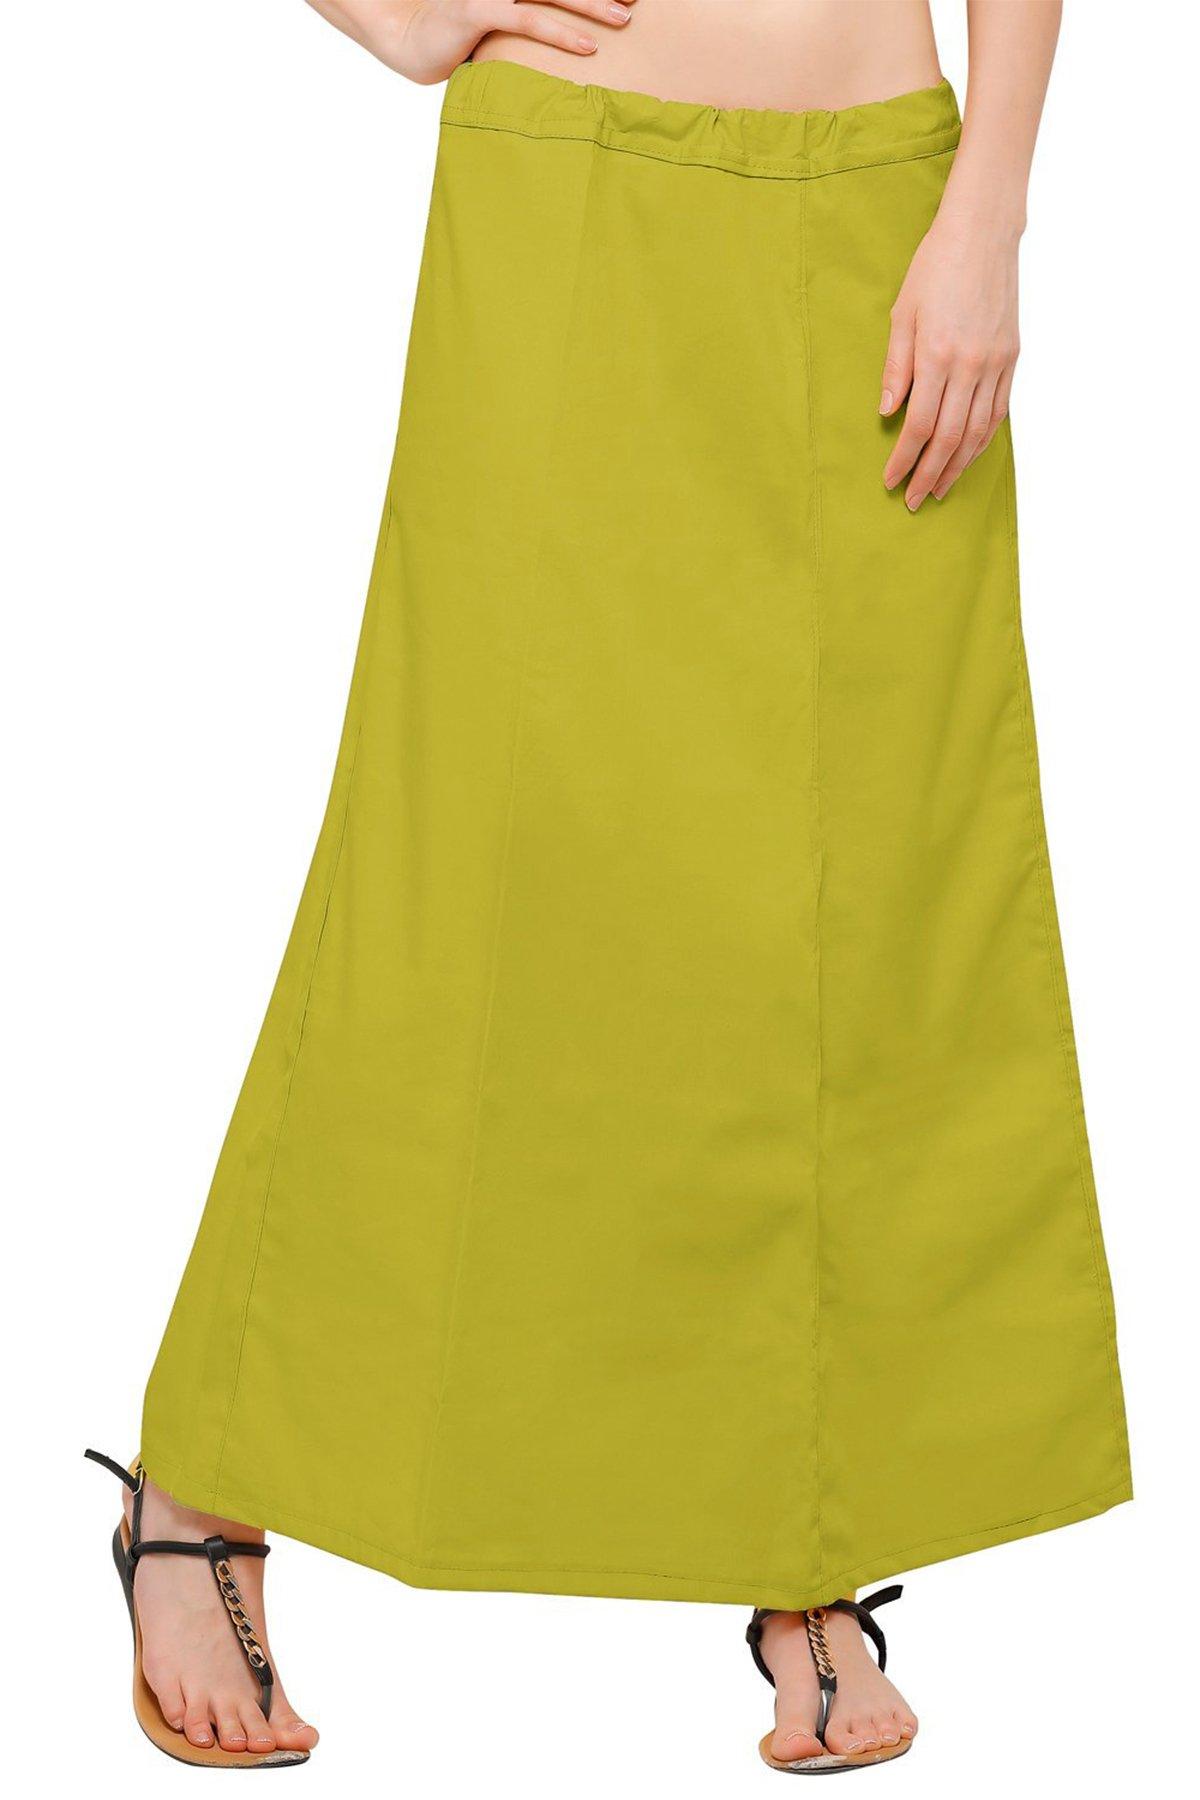 Chandrakala Women's Readymade Cotton Floor Length Sari Petticoat Underskirt Slips for Indian Sarees,Free Size (P104MEH4)